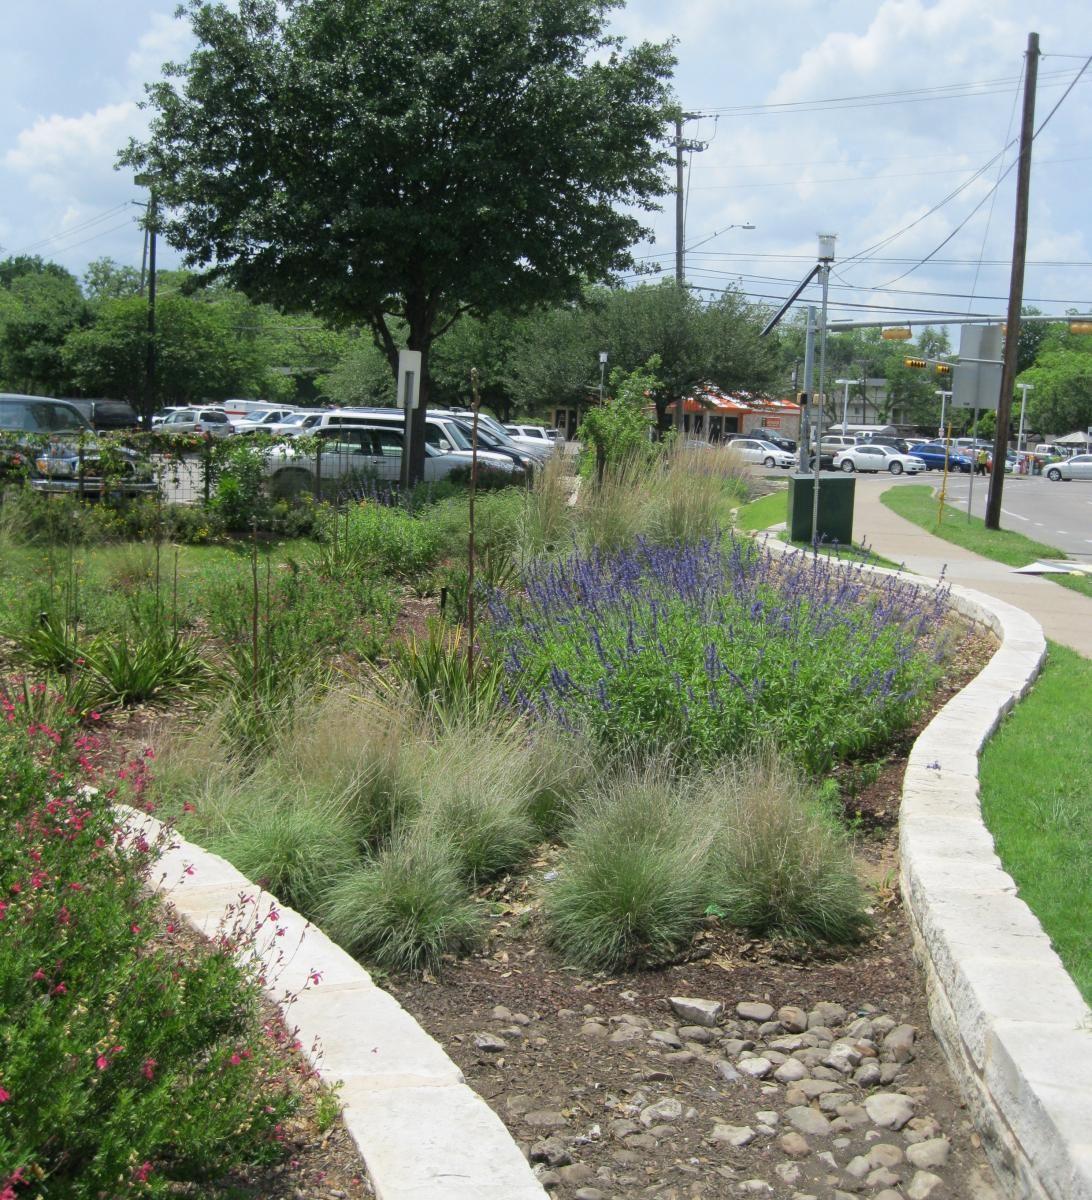 Read more about rain gardens on Imagine Austin blog